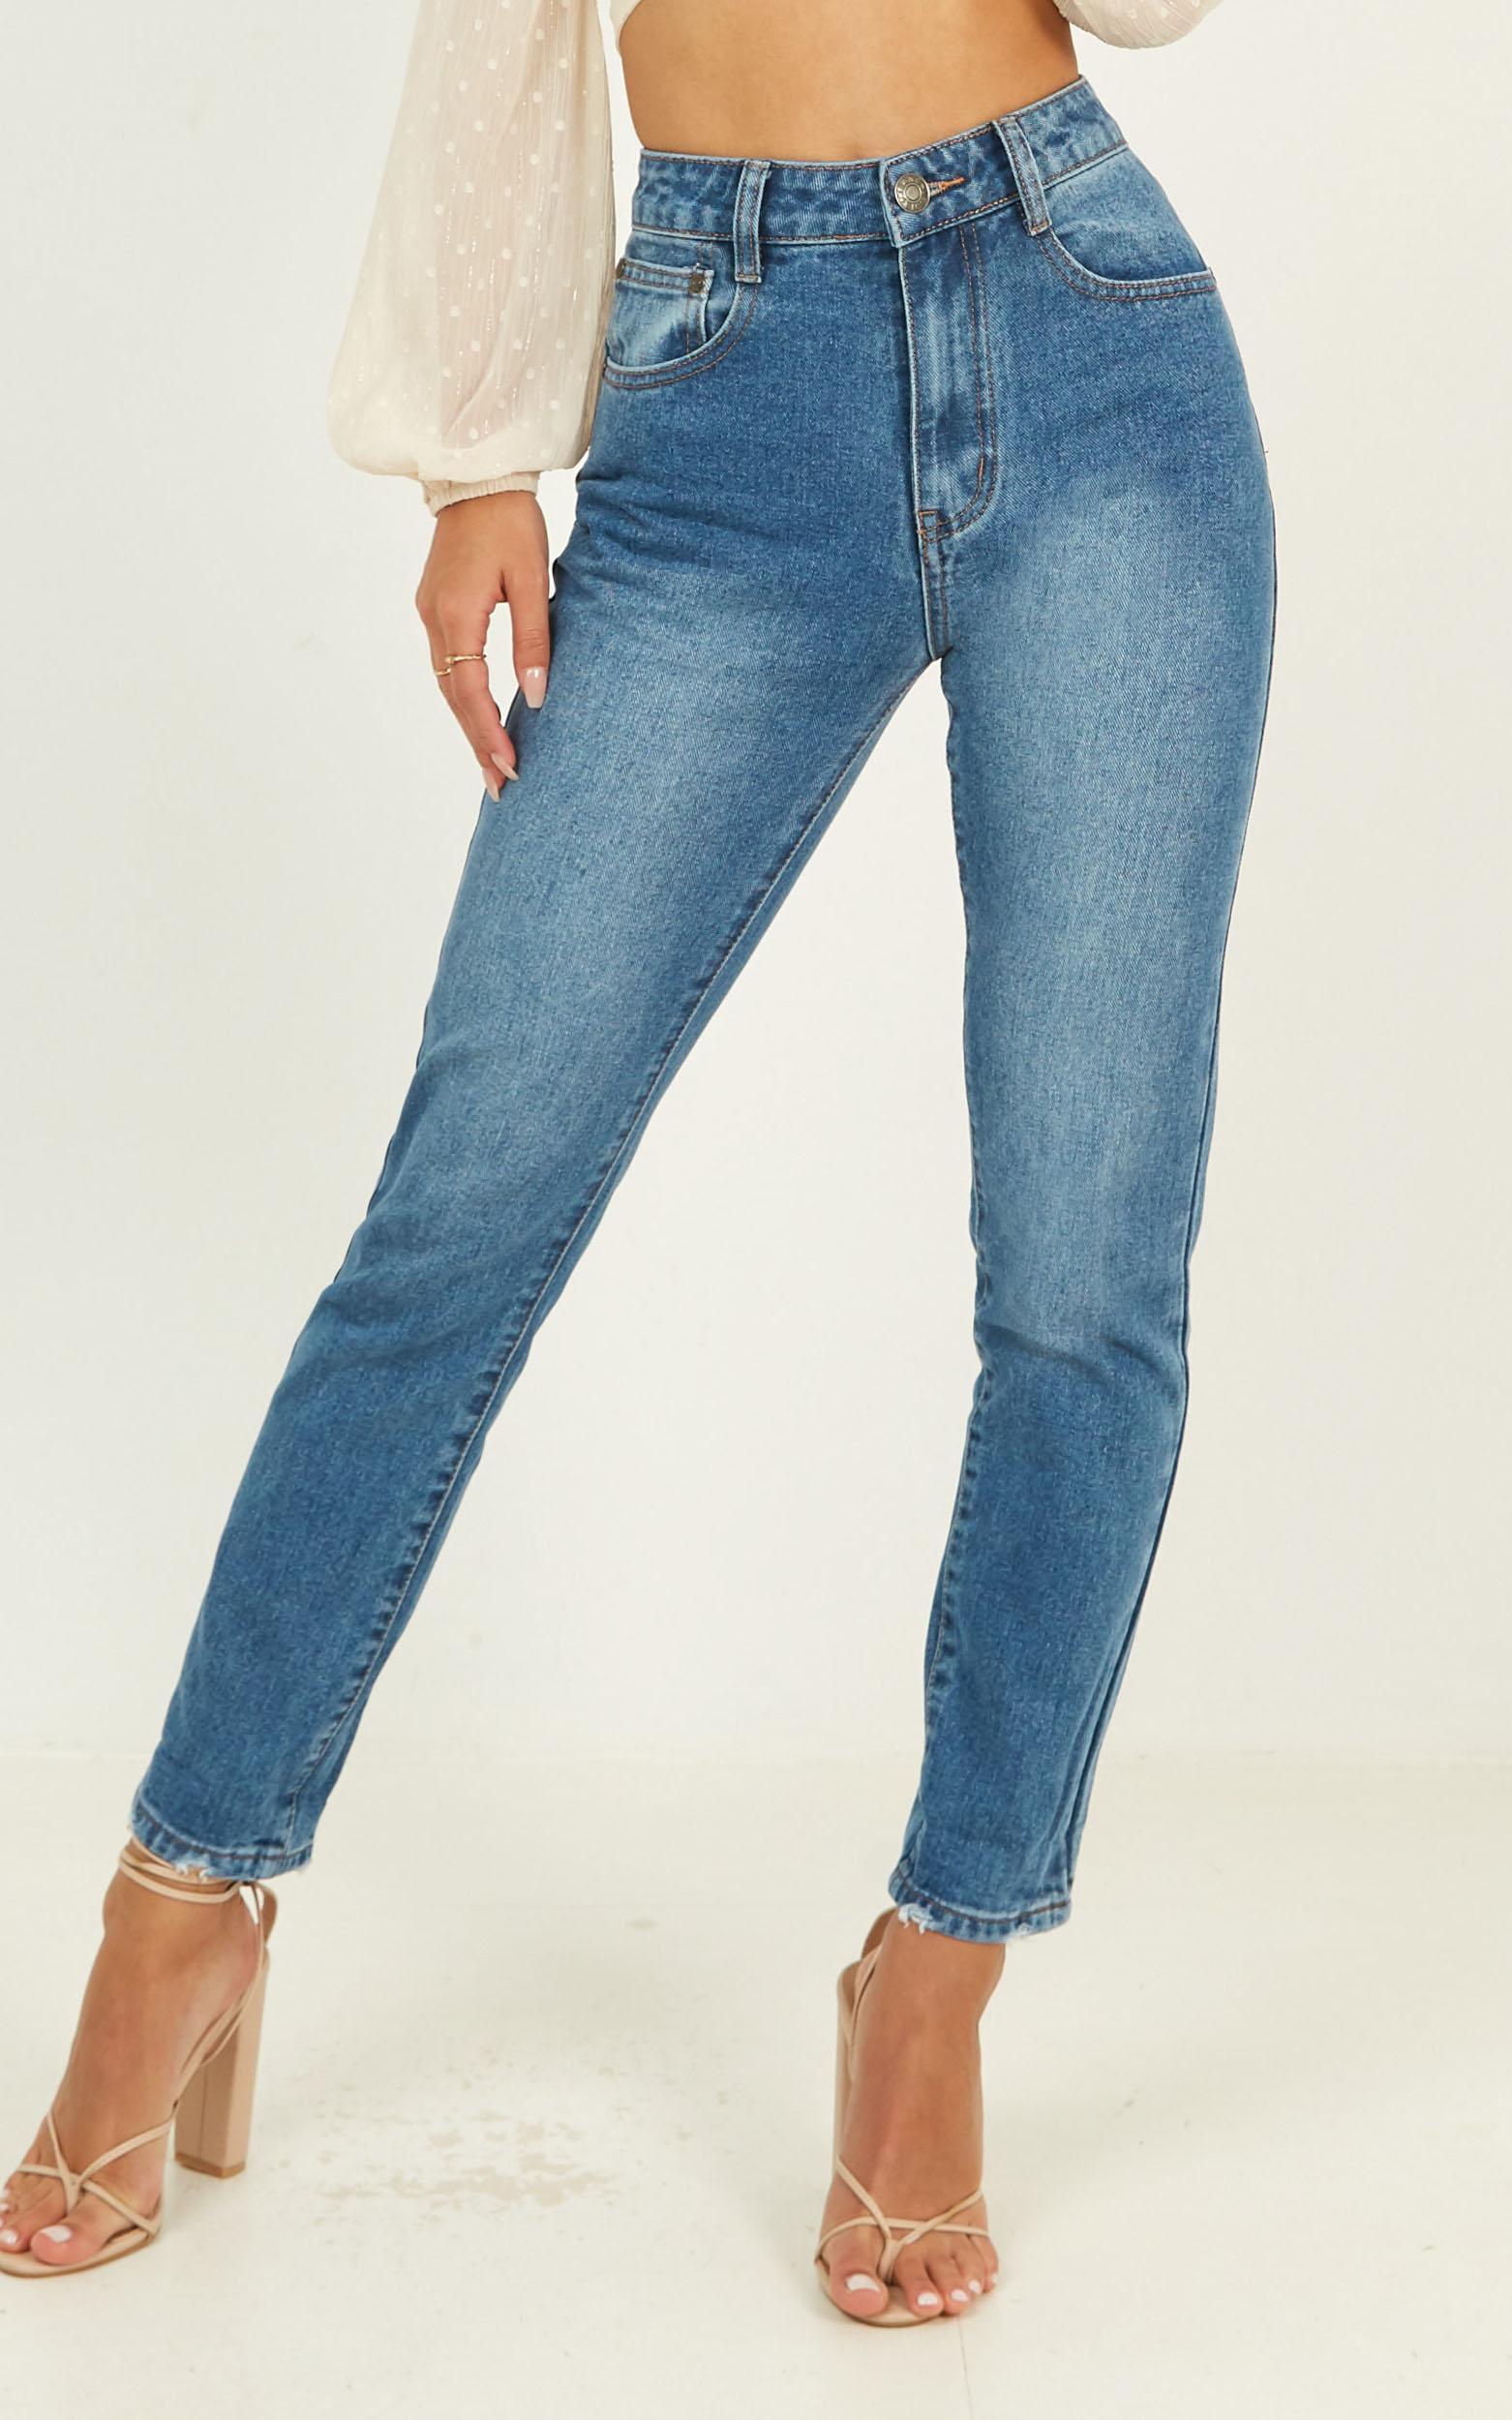 Remy Jeans in mid wash denim - 14 (XL), Blue, hi-res image number null